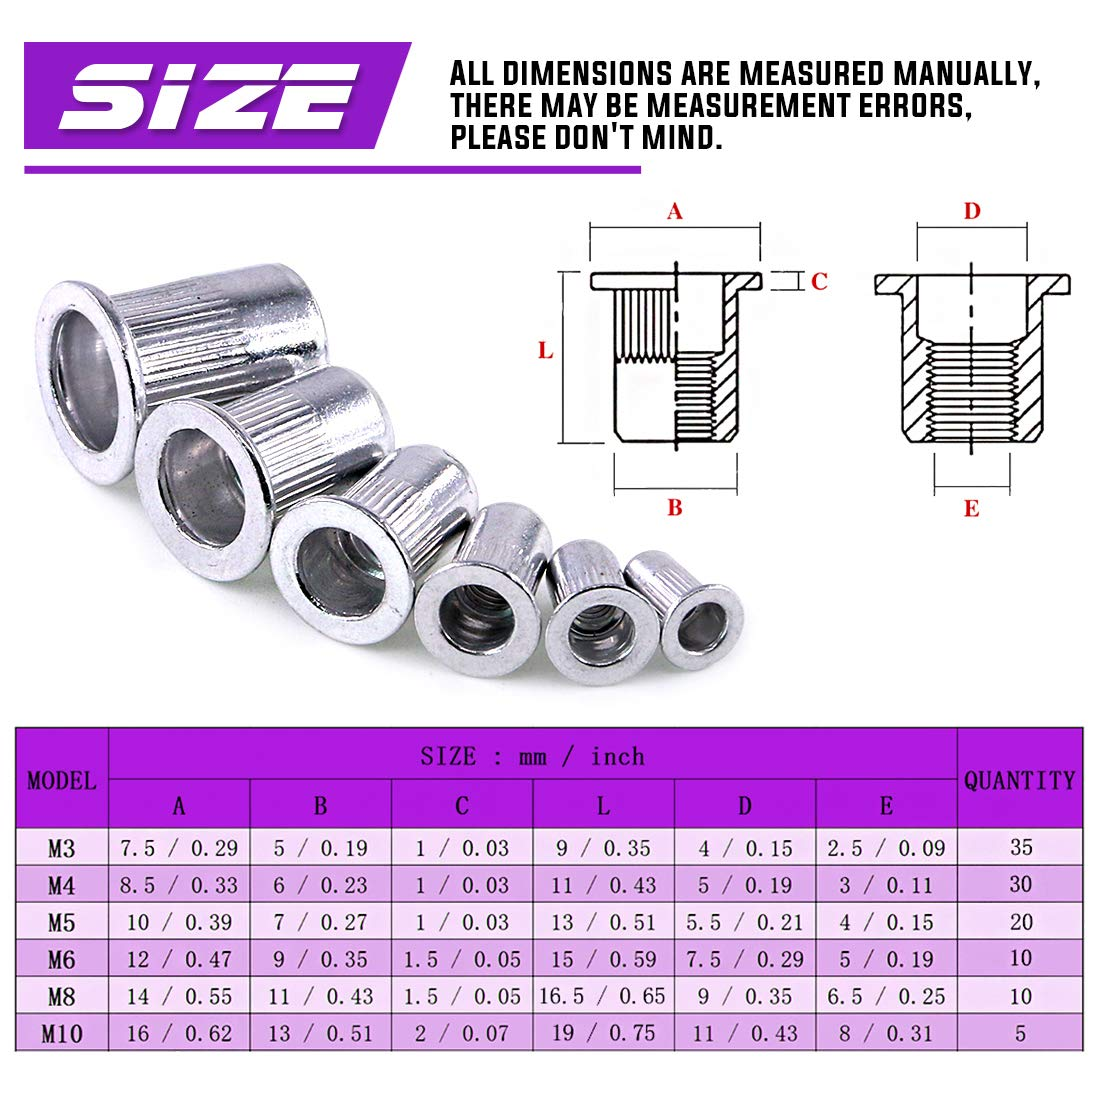 Swpeet 110Pcs Aluminum Alloy Flat Head Rivet Nut Kit, Including Assorted M3 M4 M5 M6 M8 M10 Aluminum Treaded Insert Nutsert Perfect for Providing High Strength Load Bearing Threads by Swpeet (Image #2)